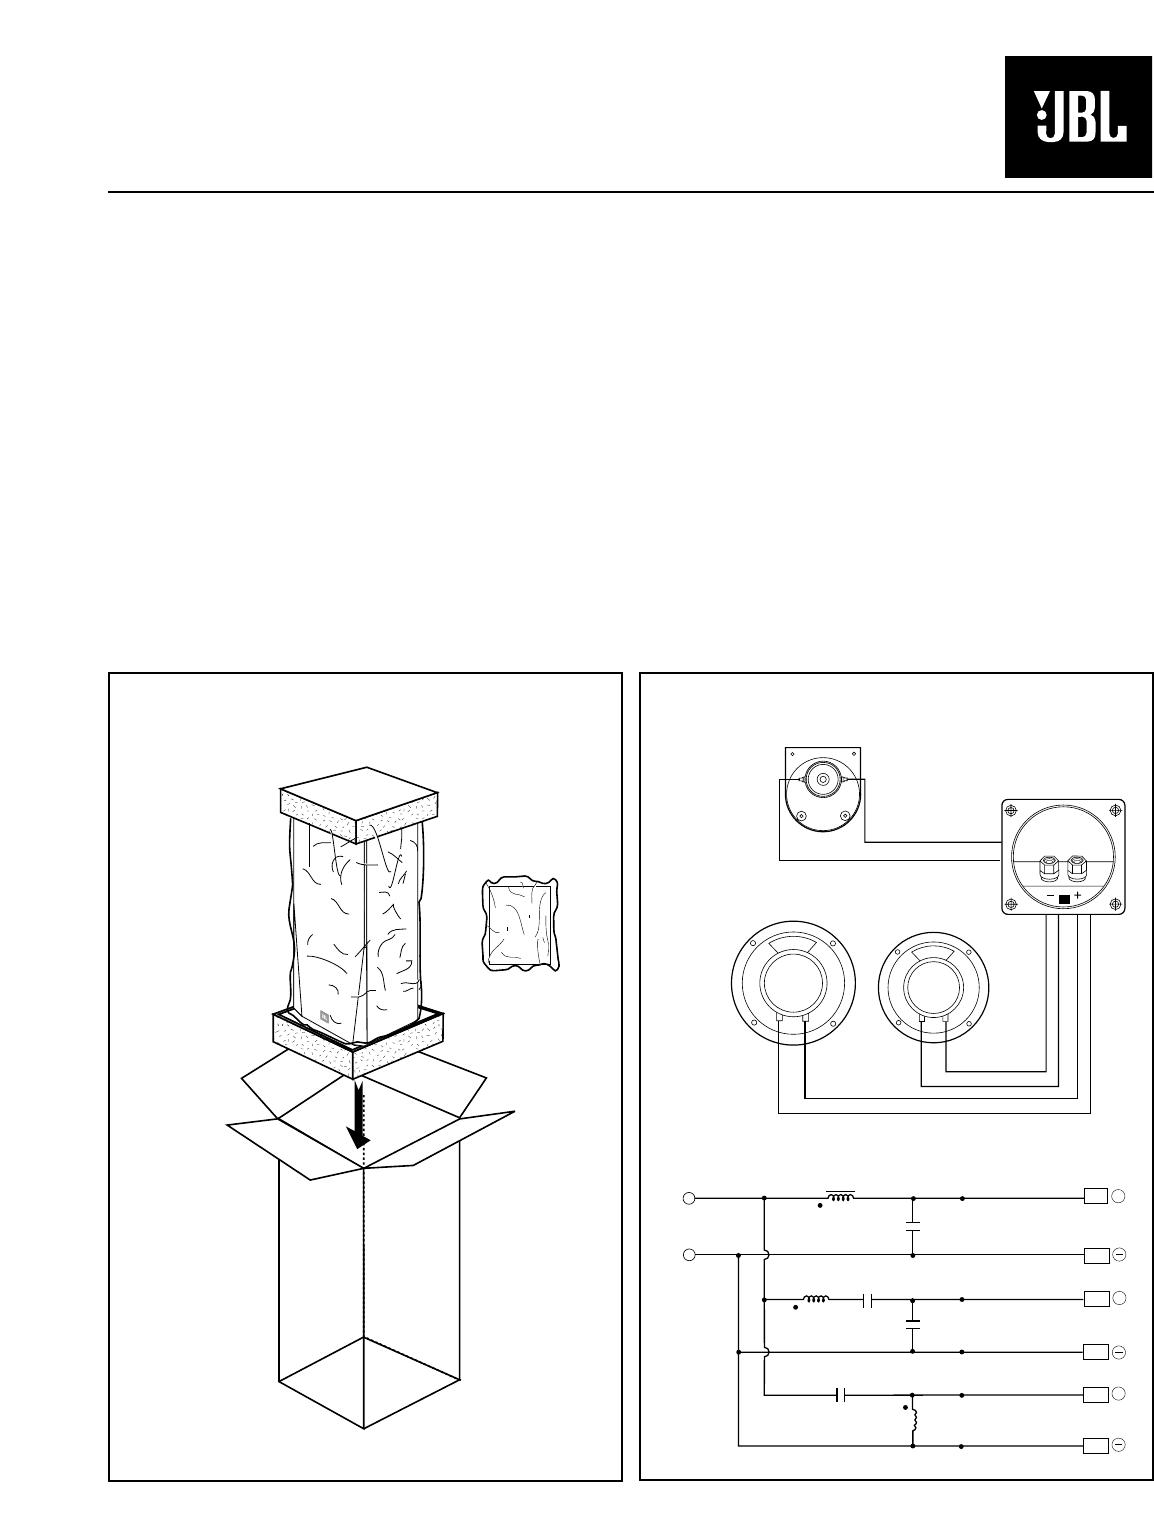 JBL TLX151 technical manual